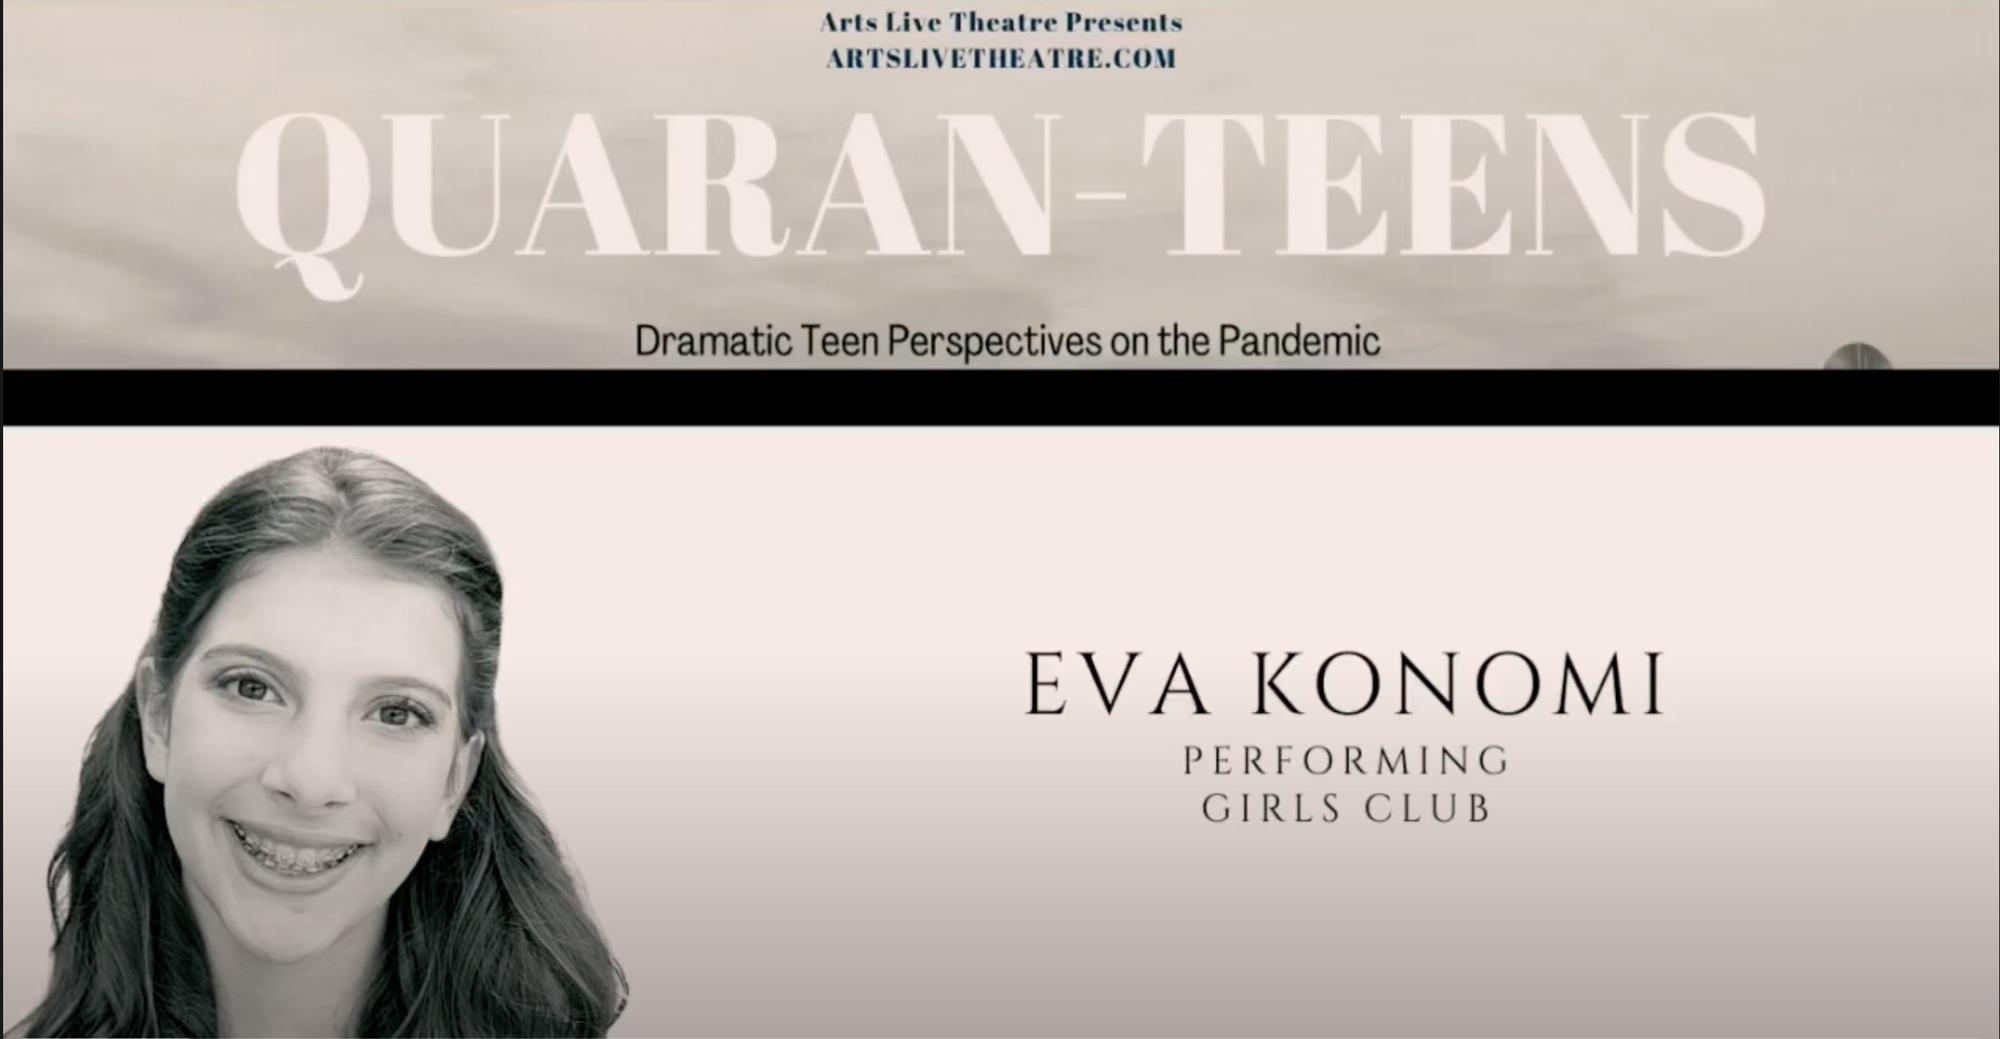 Quaran-Teens: Eva Konomi performing Girls Club